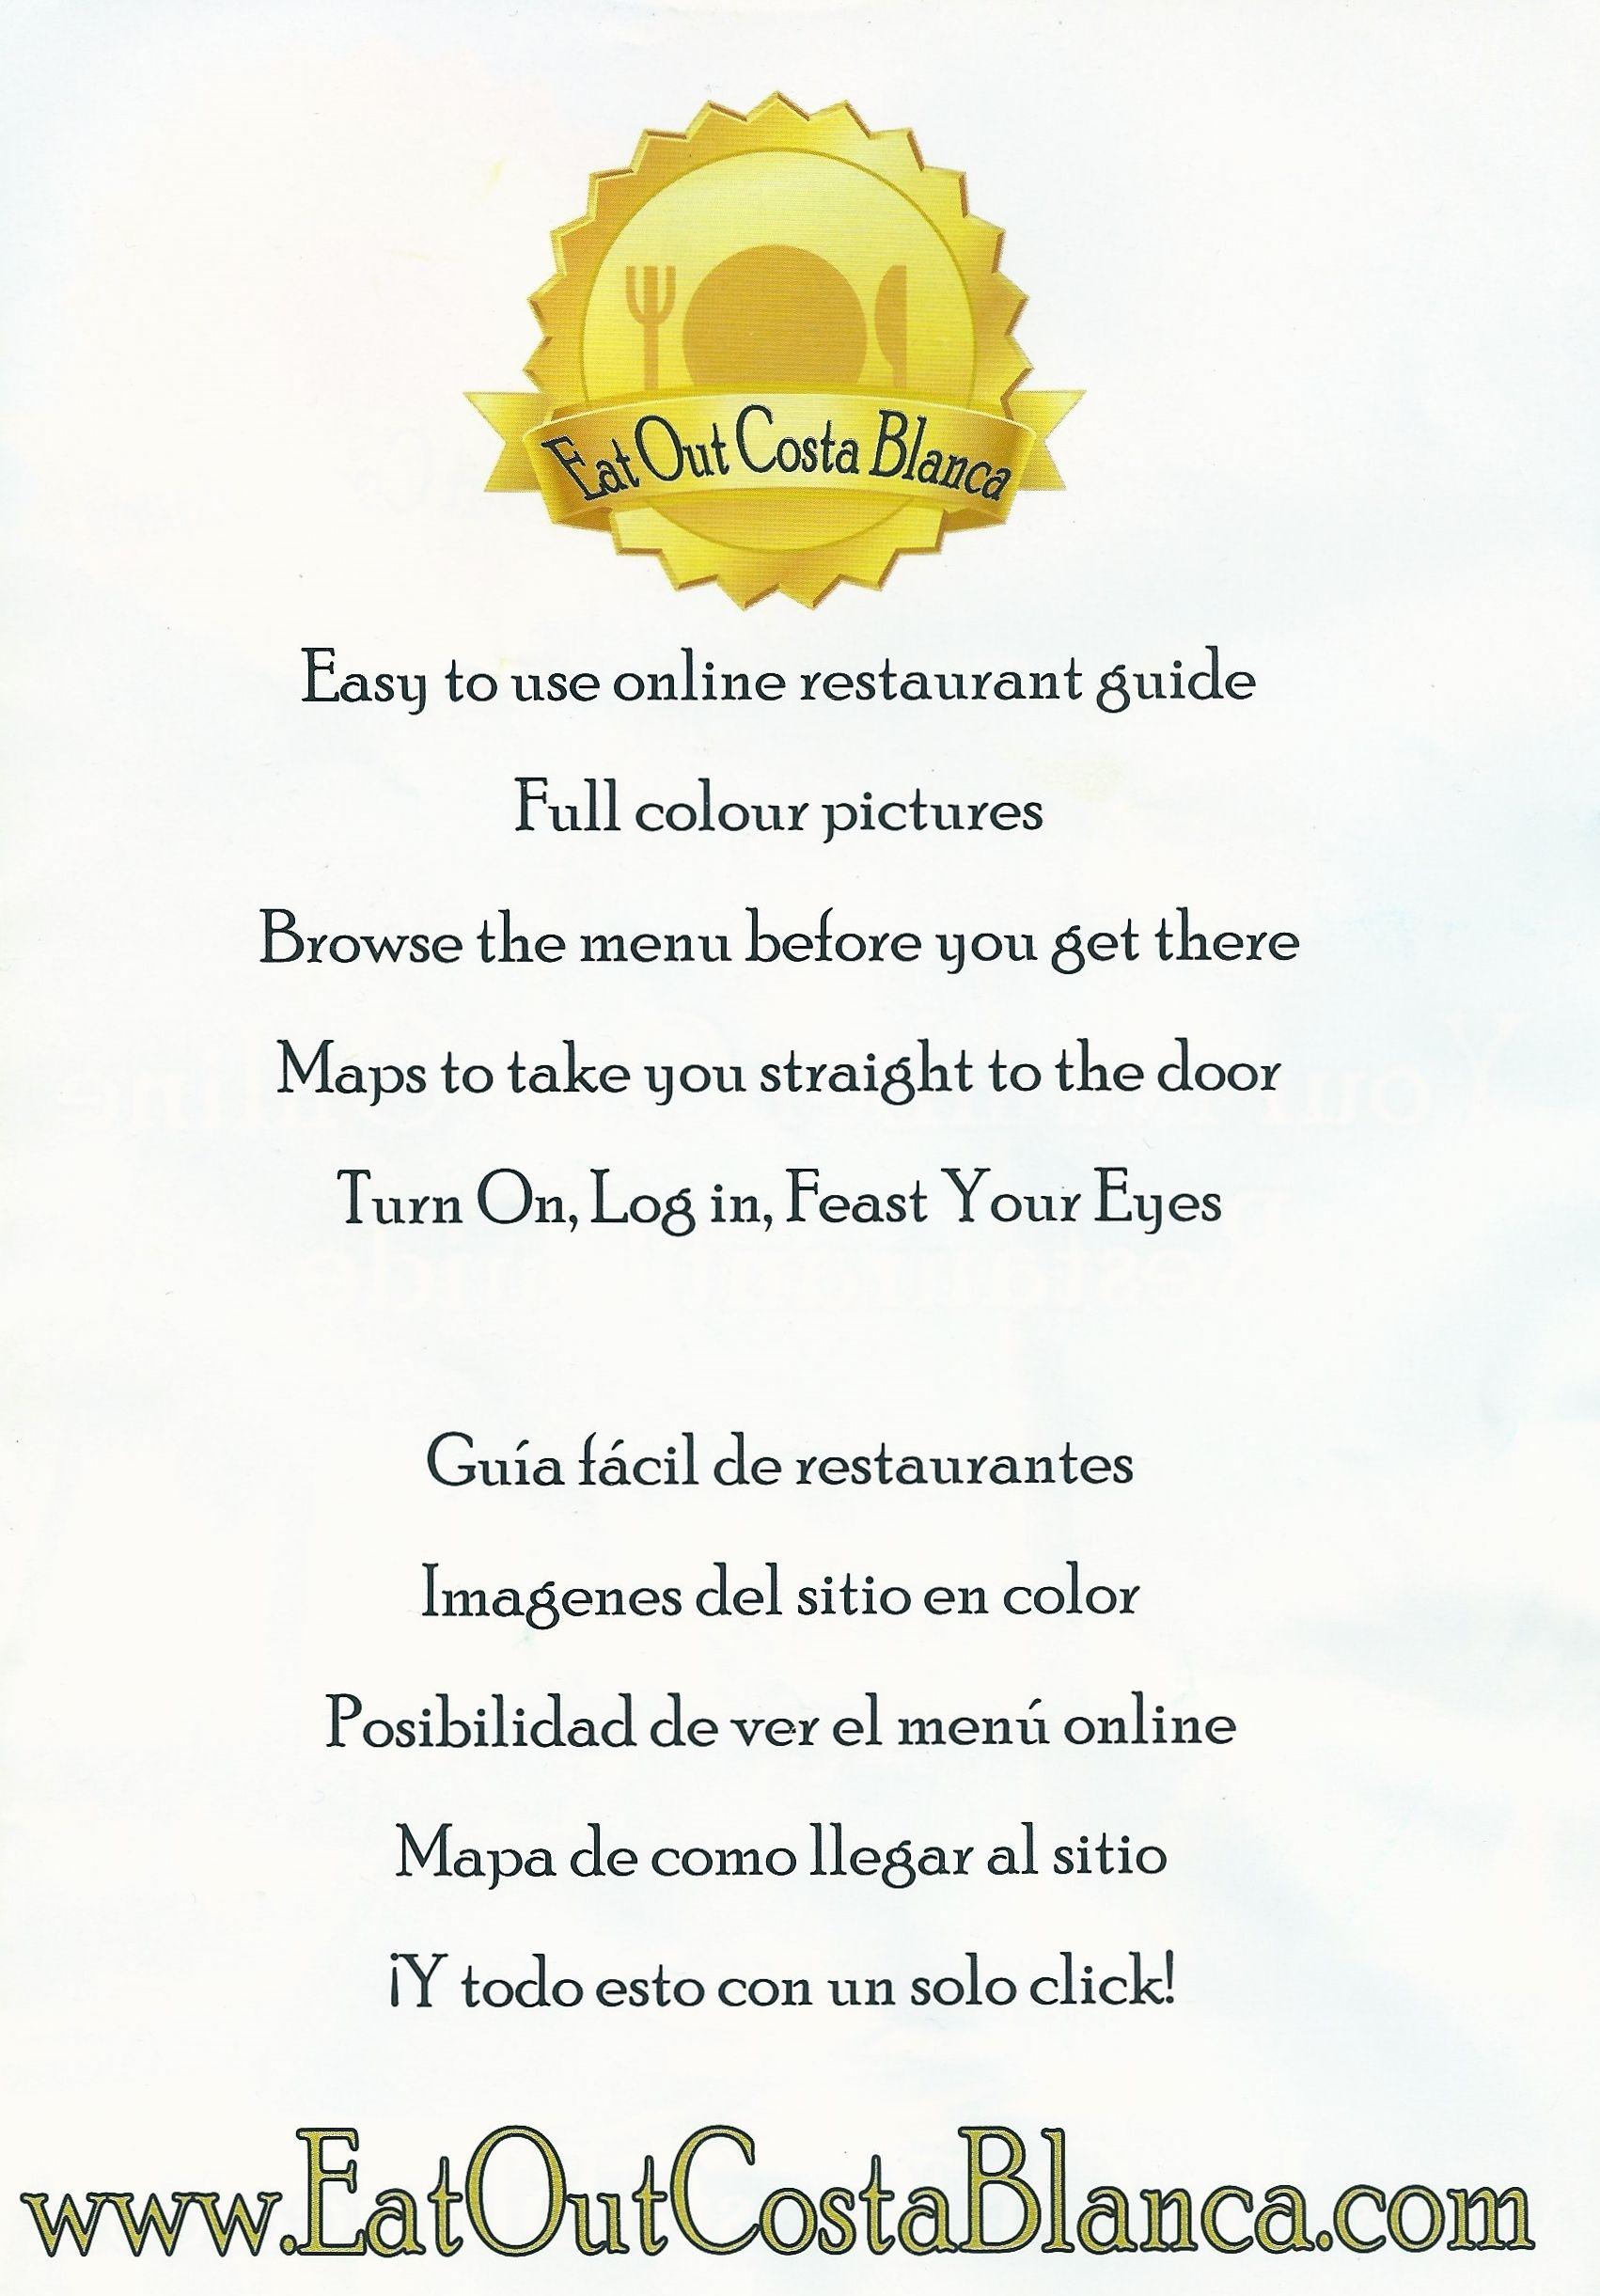 www.eatoutcostablanca.com   Eat Out Costa Blanca   Pinterest